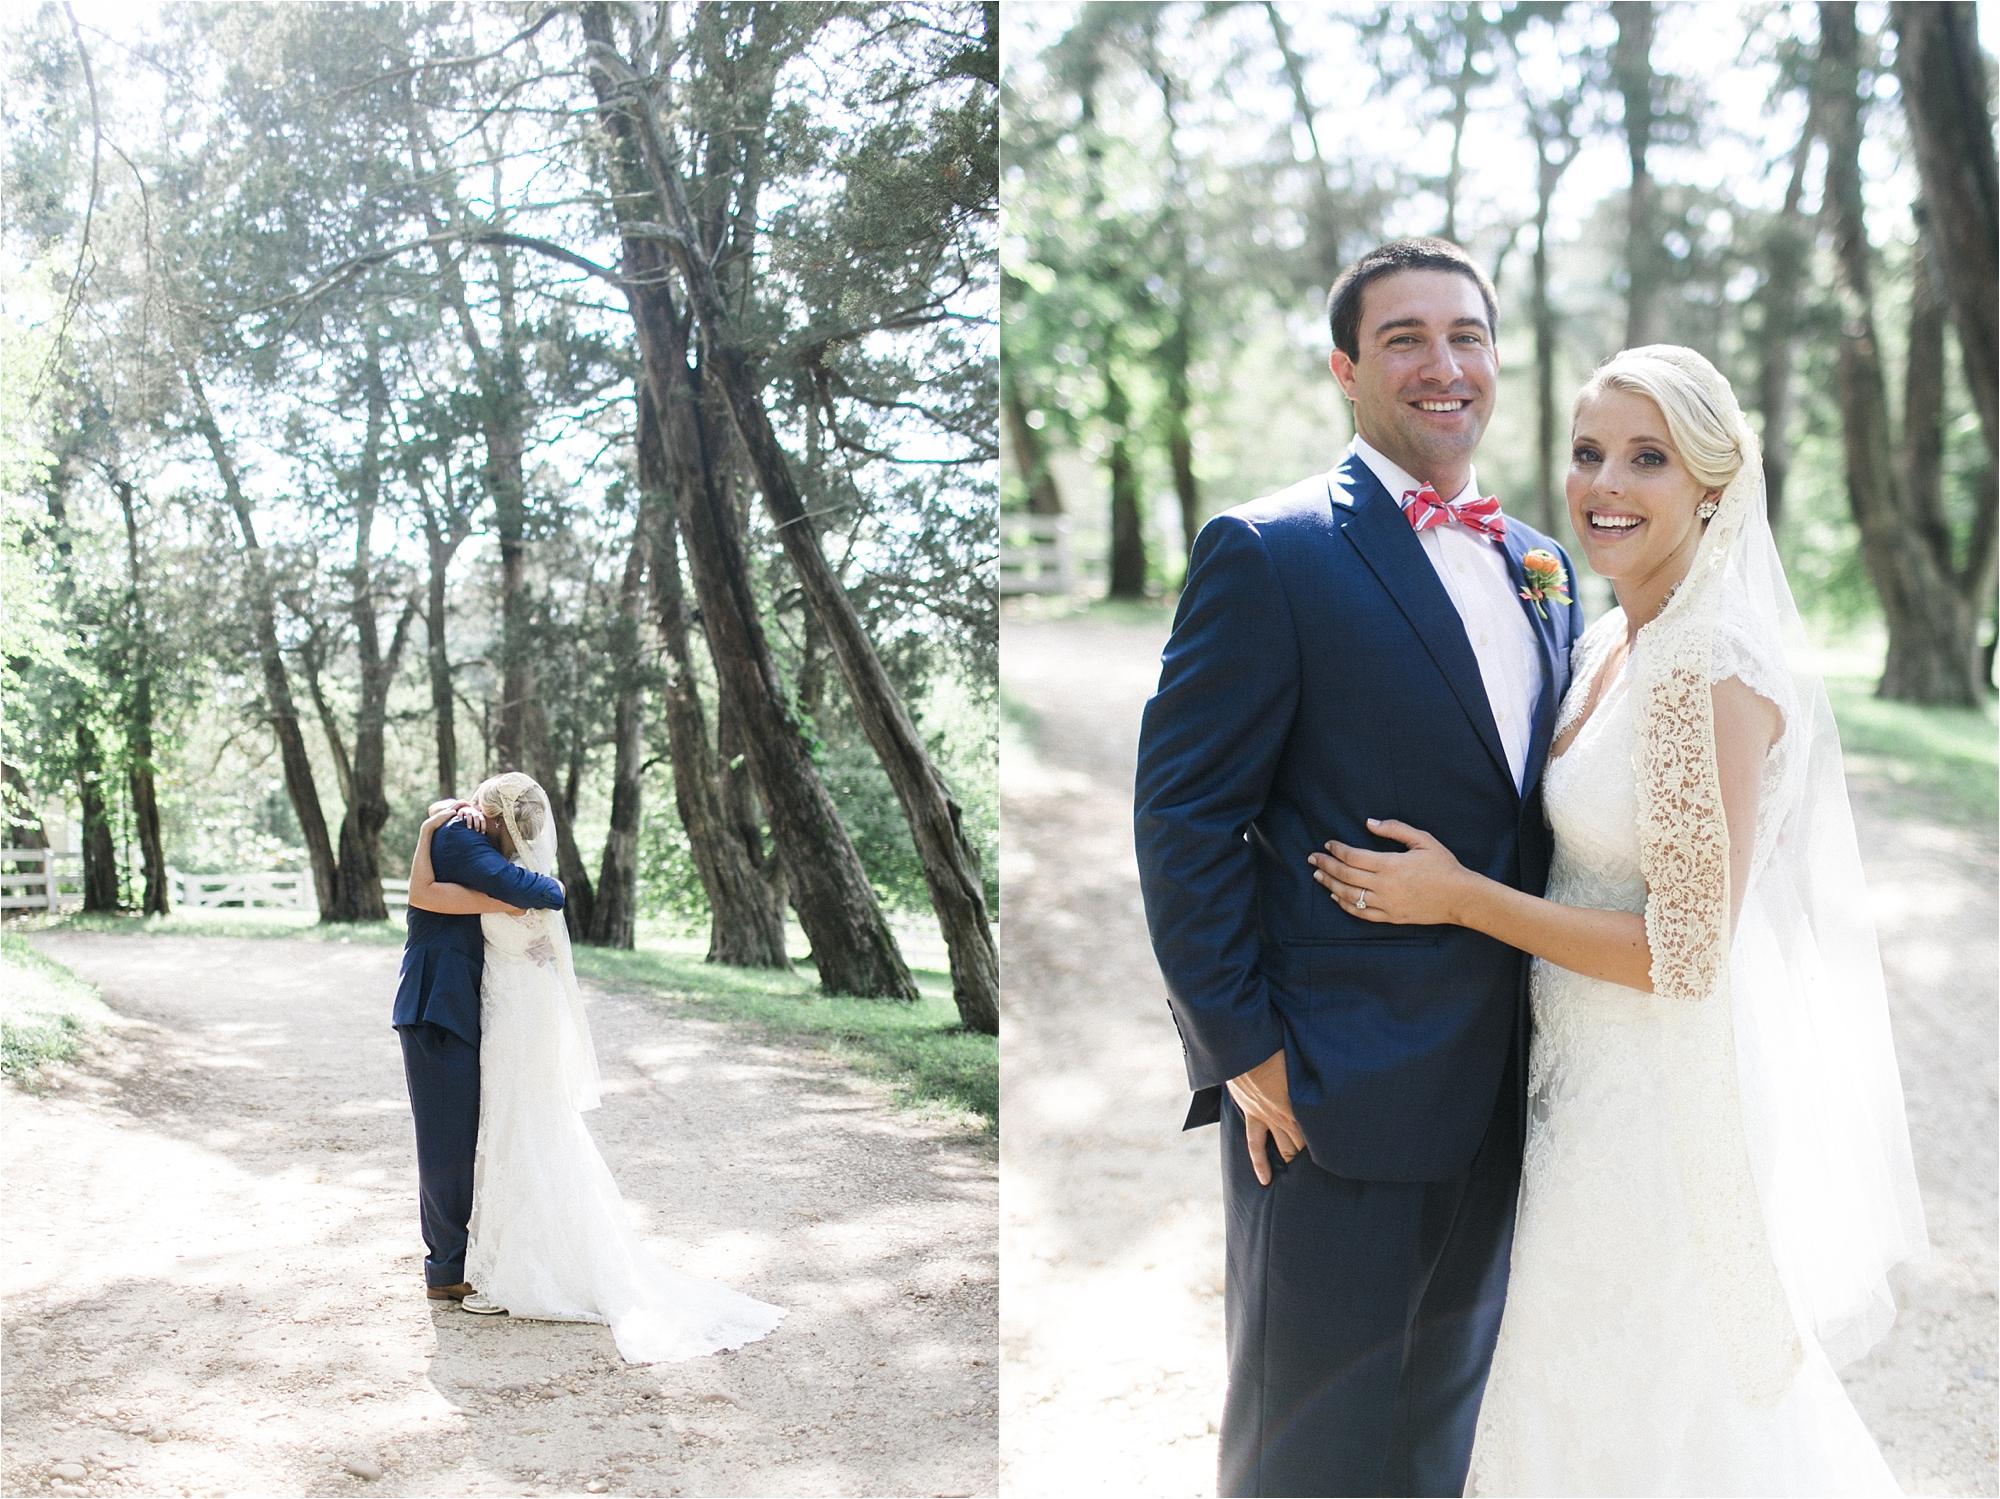 richmond-virginia-tuckahoe-plantation-coral-summer-wedding-stephanie-yonce-photos_0014.jpg